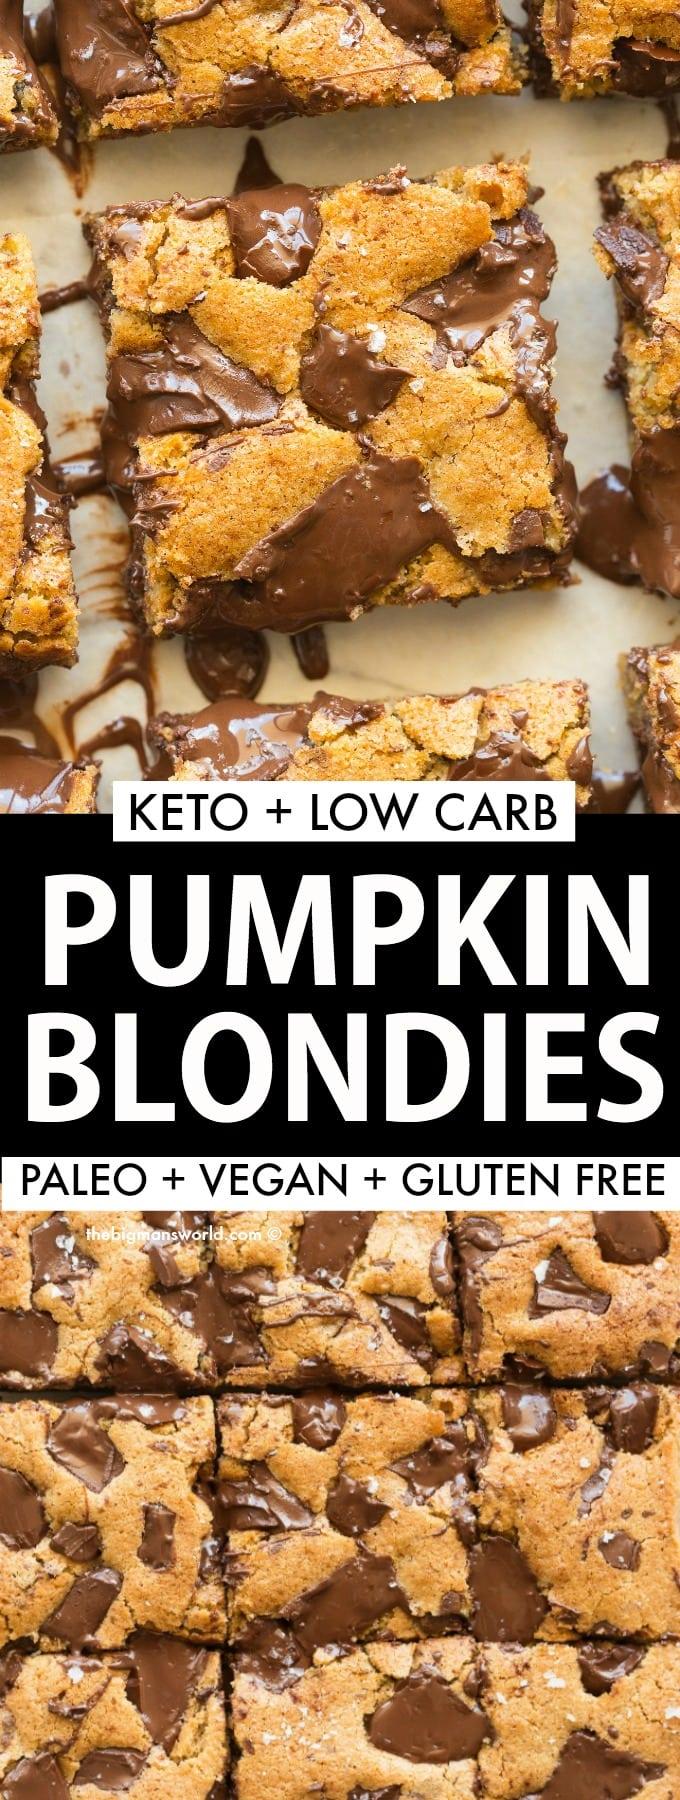 Keto Vegan Pumpkin Blondies with chocolate chips